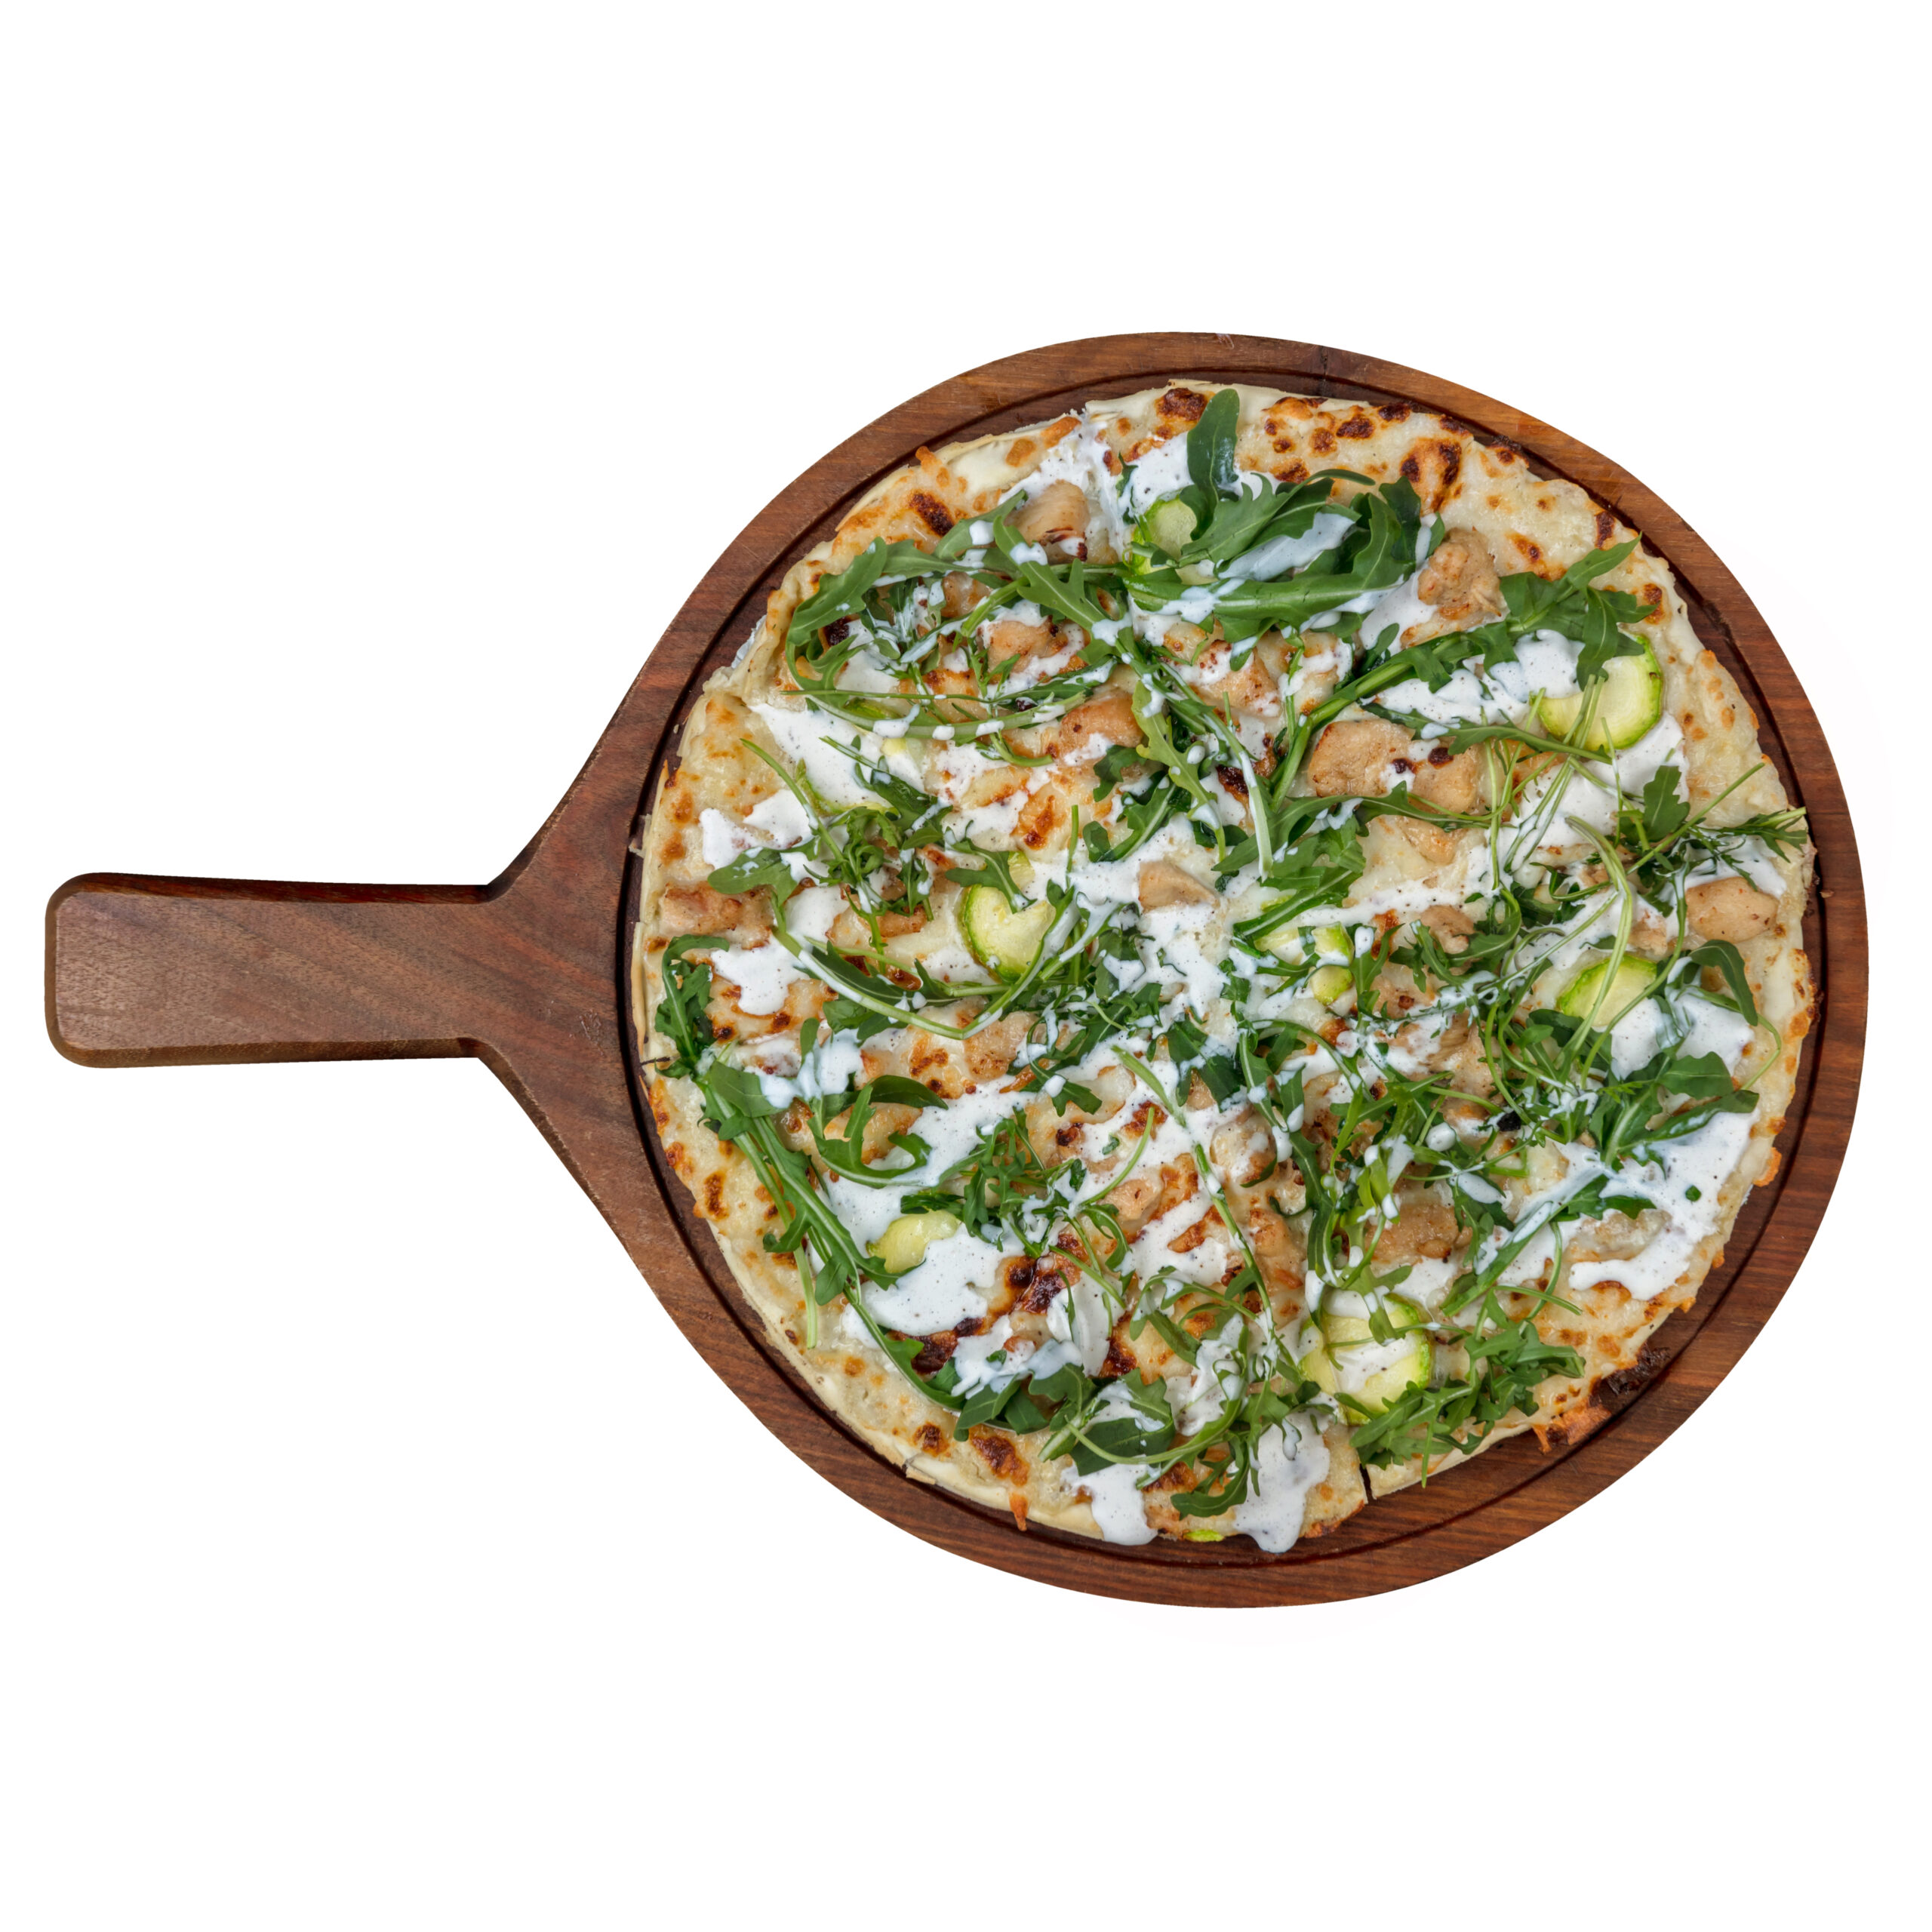 پیتزا مرغ سزار